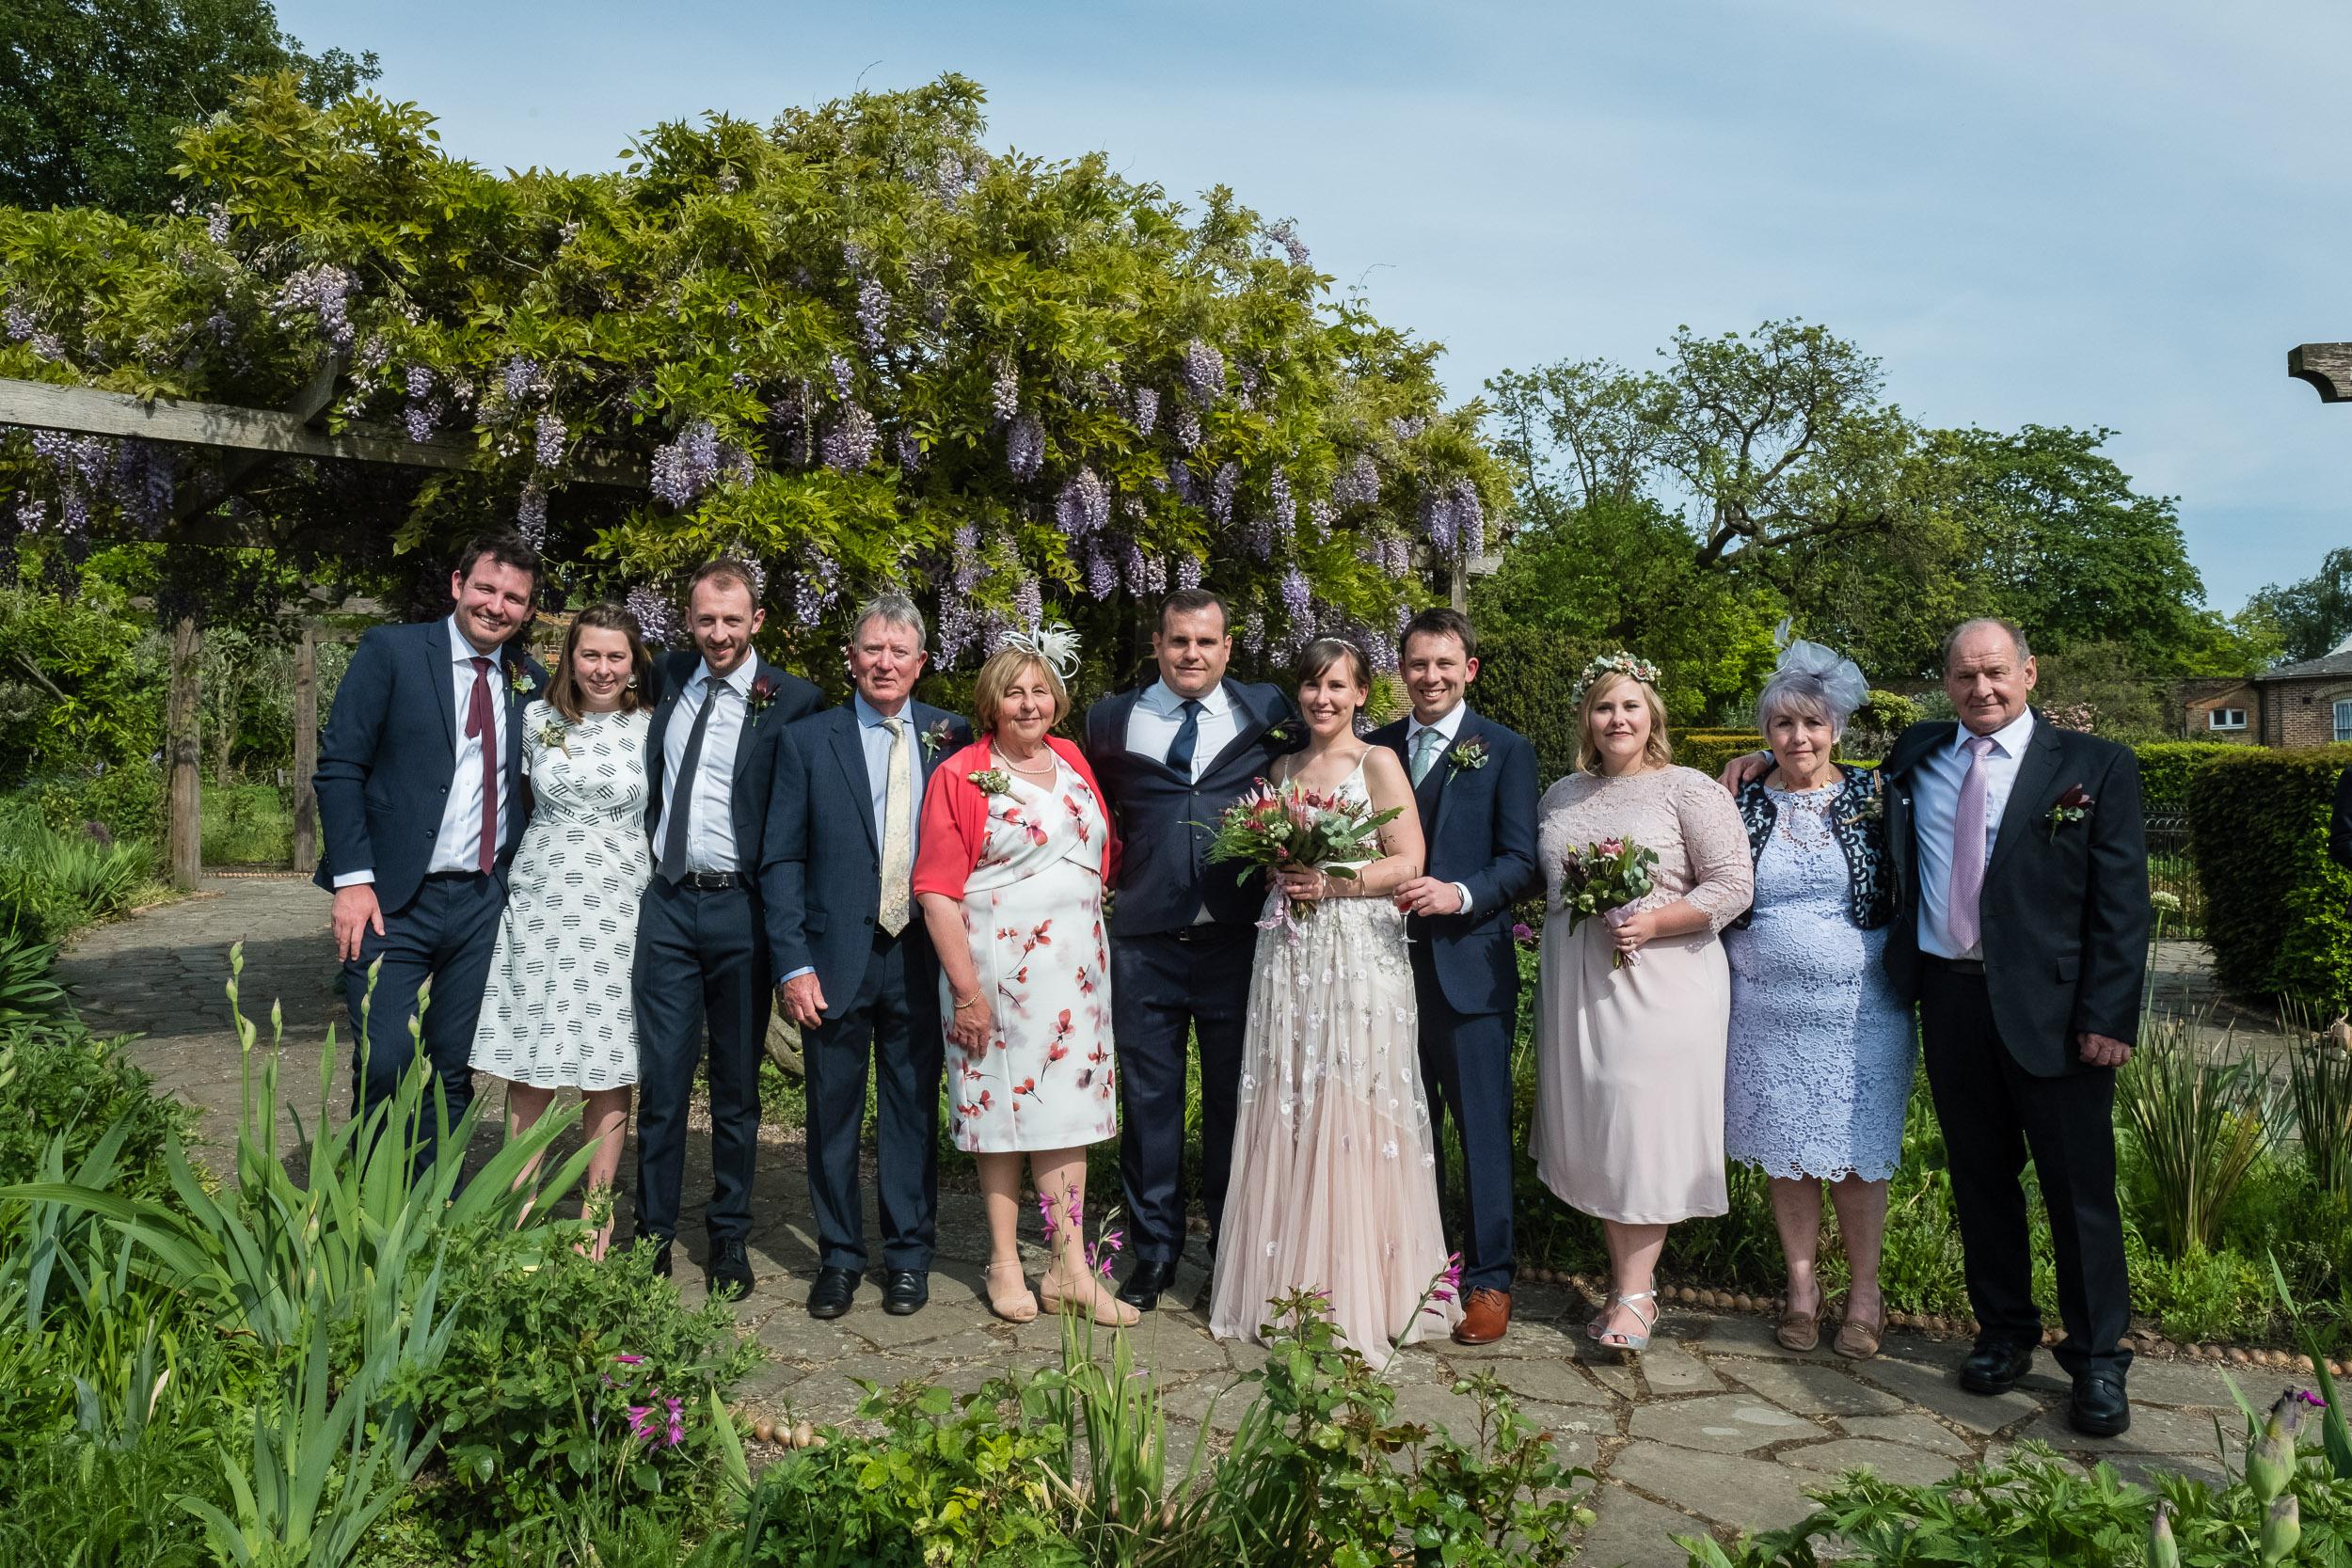 brockwell-lido-brixton-herne-hill-wedding-258.jpg